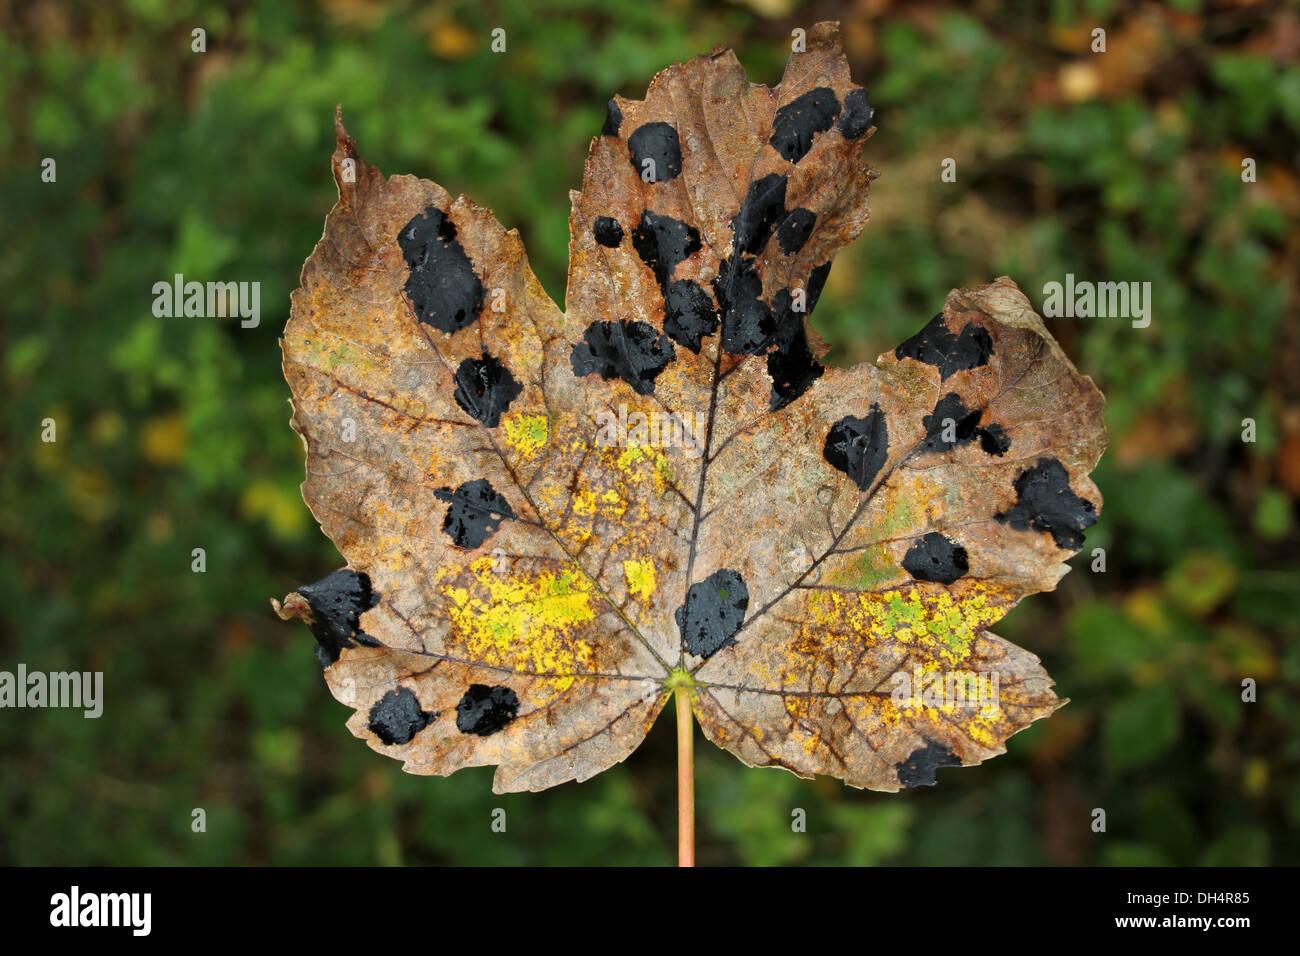 Tar Spot Fungus Rhytisma acerinum On Sycamore Leaf - Stock Image